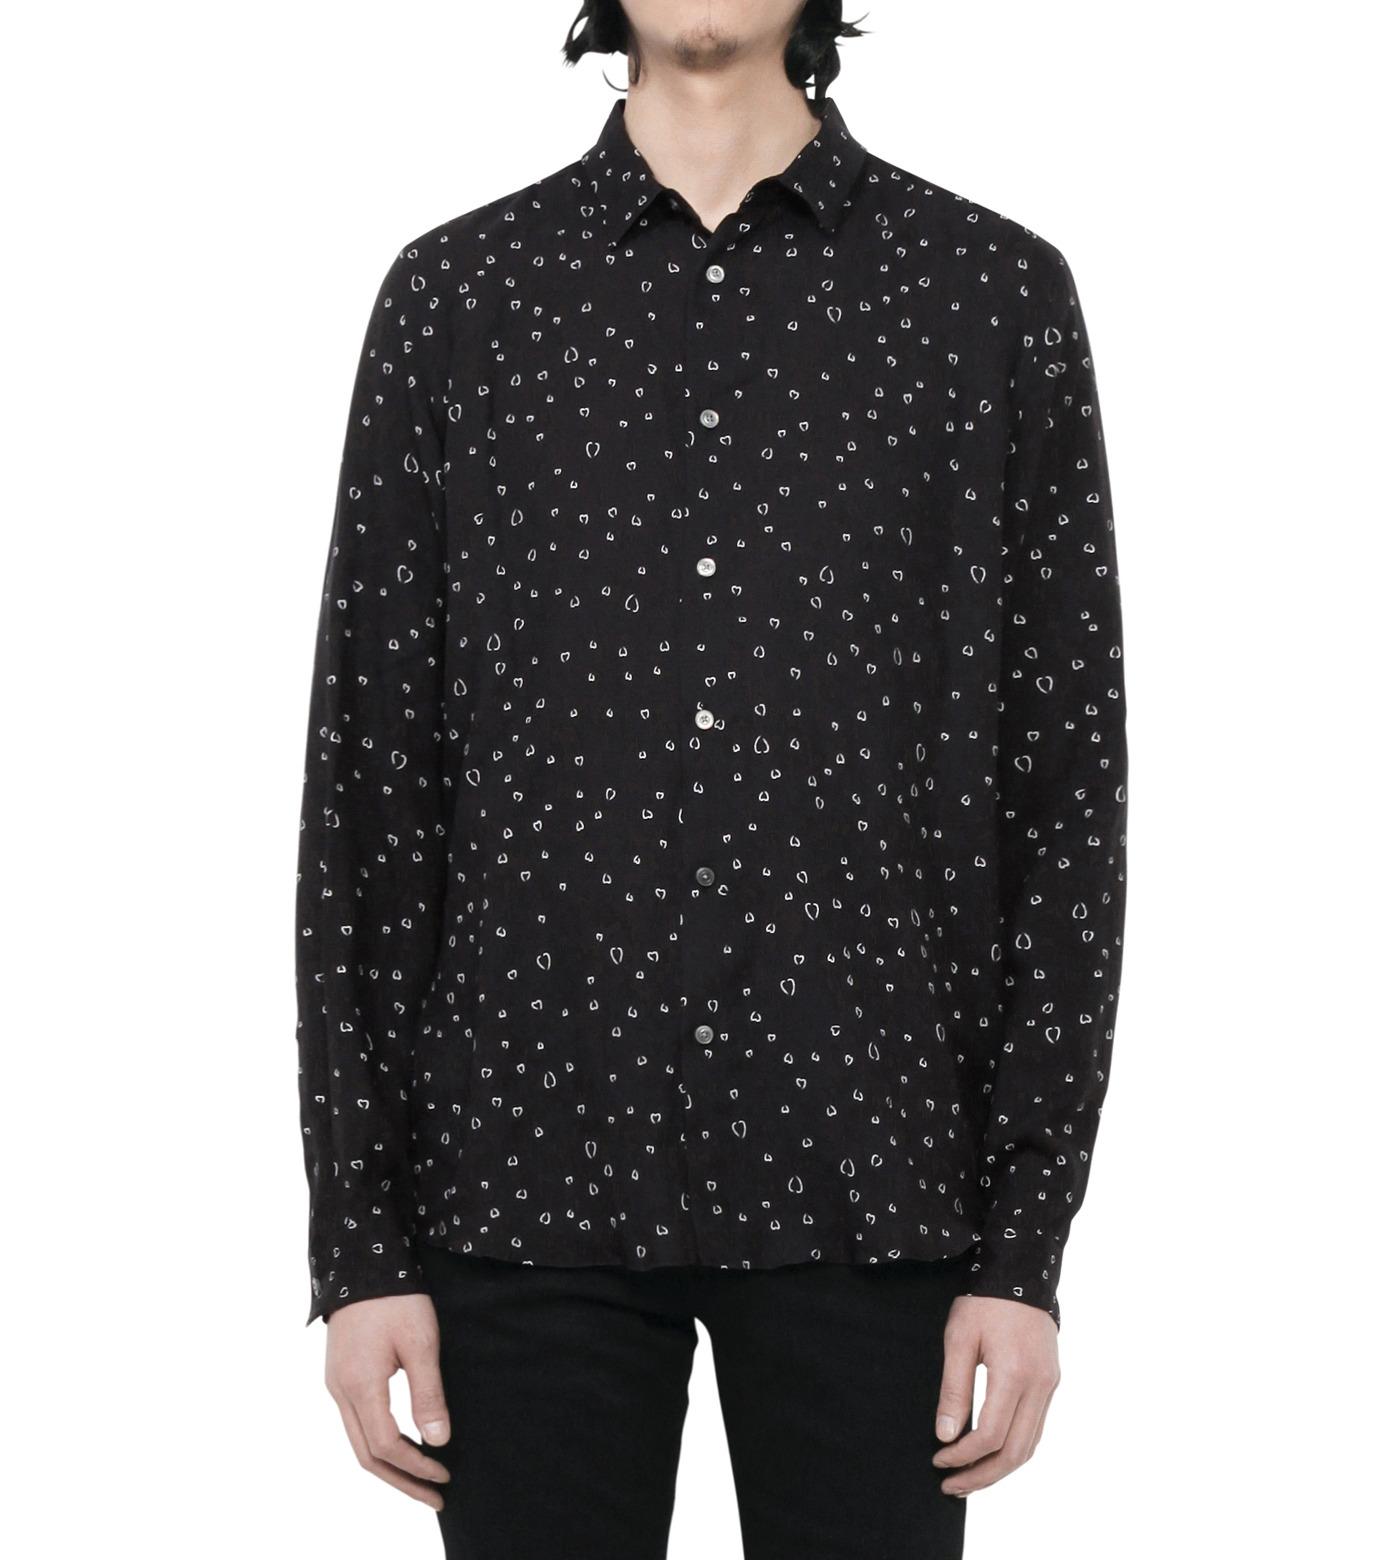 HL HEDDIE LOVU(エイチエル・エディールーヴ)のLINE HEART PATTERN SHIRT-BLACK(シャツ/shirt)-18S93002-13 拡大詳細画像3